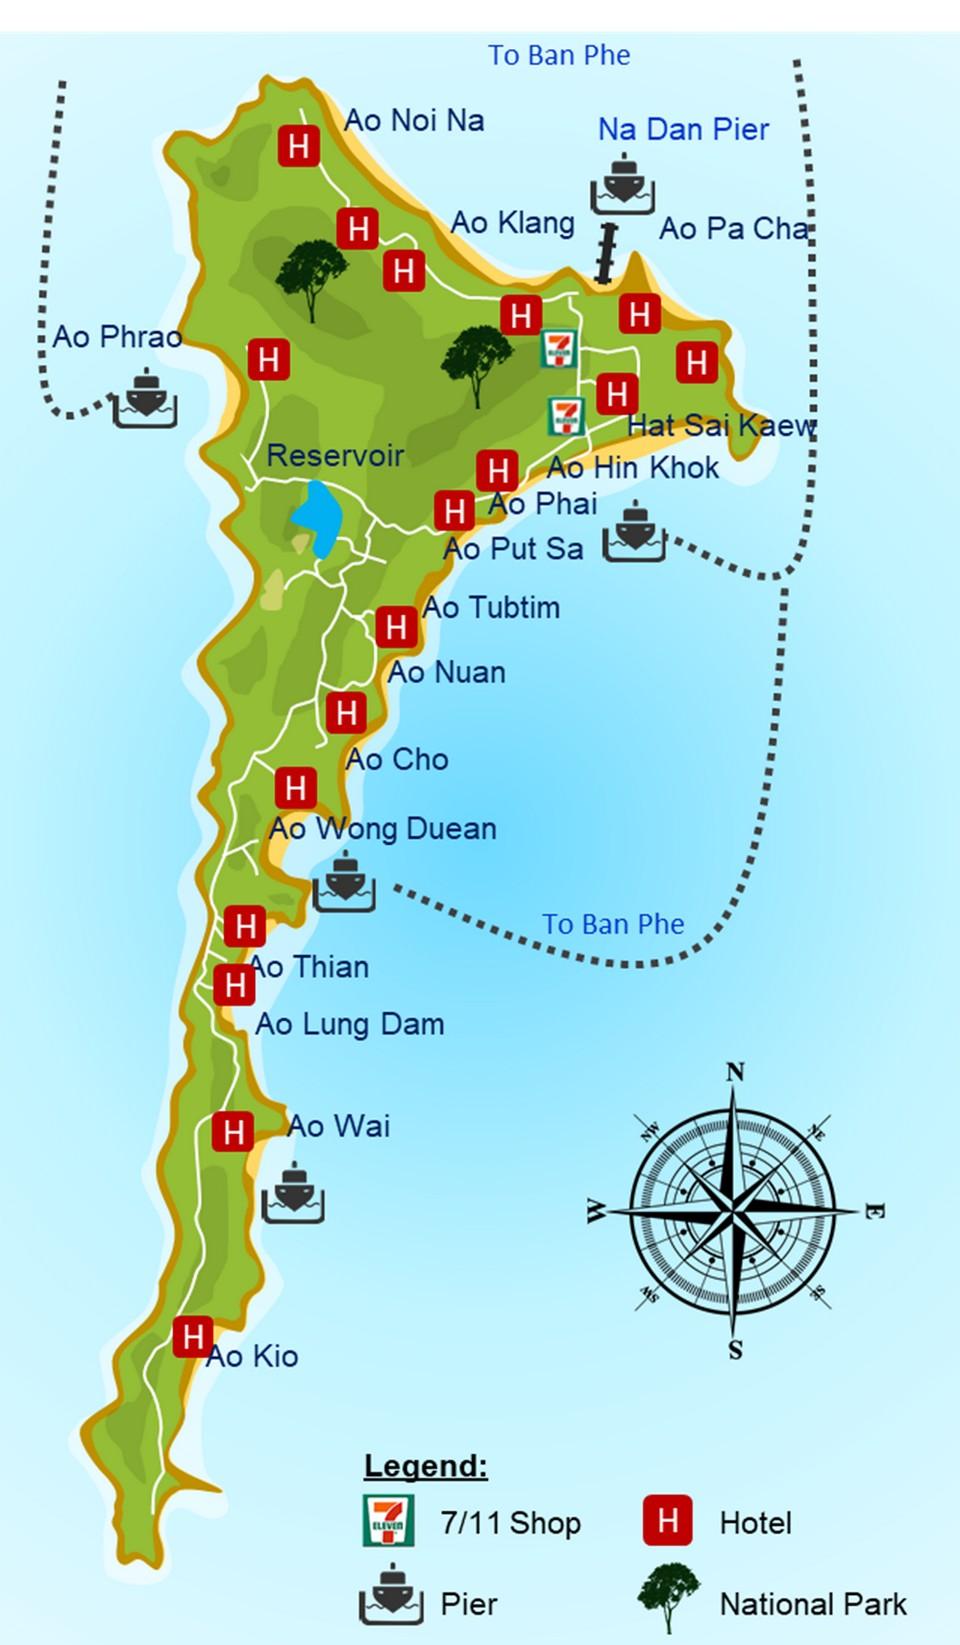 bangkok to koh samet,koh samet blog,koh samet guide,koh samet travel blog,koh samet travel guide (1)